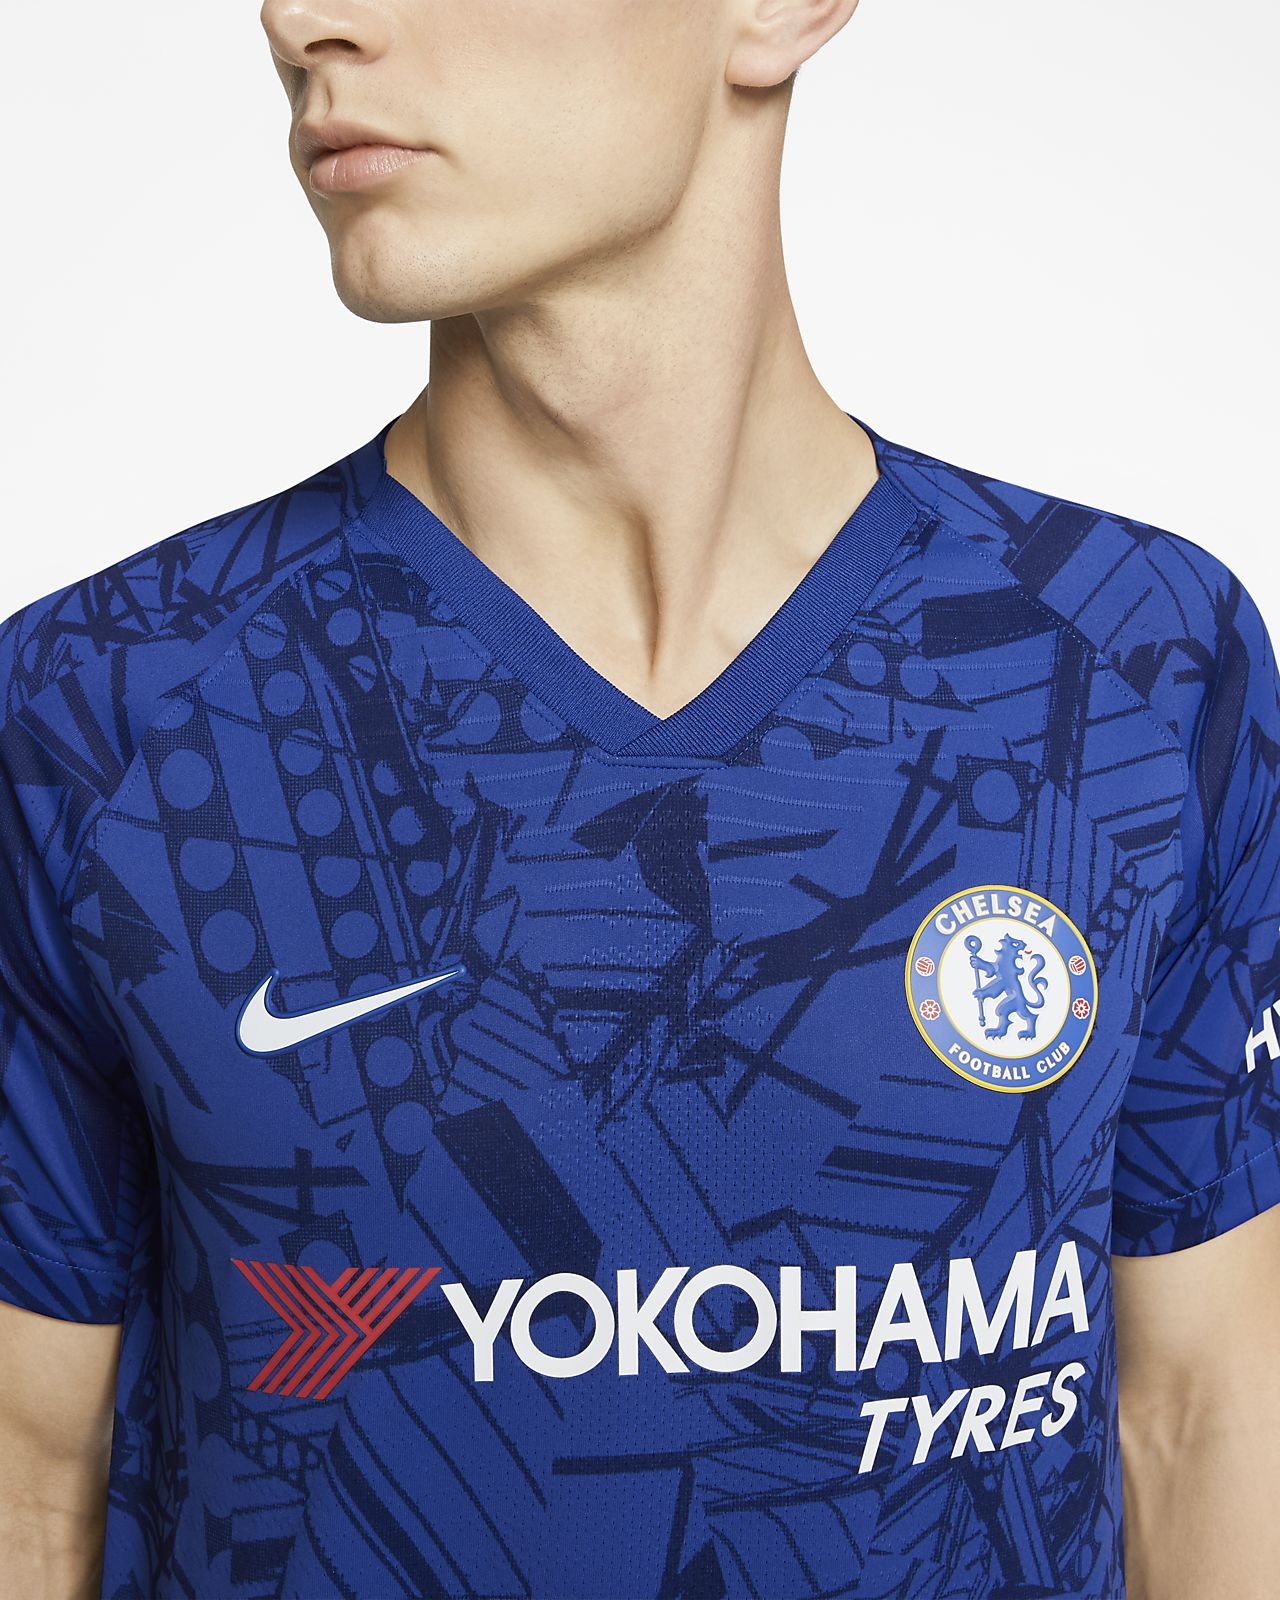 finest selection 31480 8e0ae Chelsea FC 2019/20 Vapor Match Home Men's Football Shirt